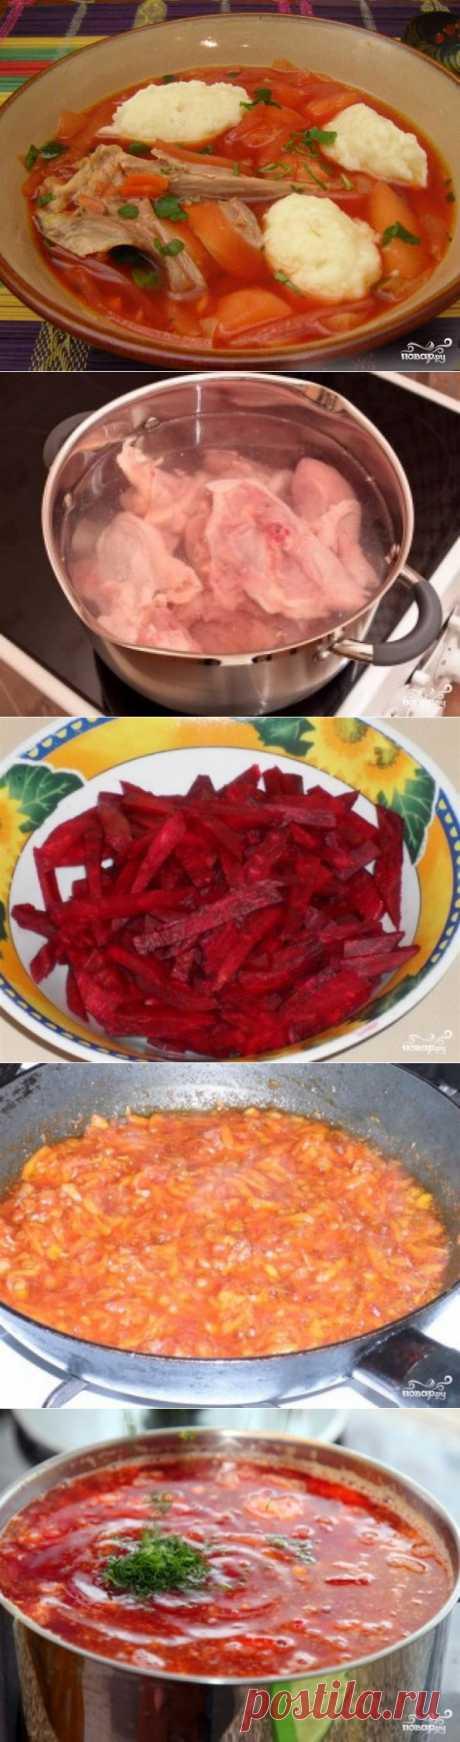 Борщ с галушками - пошаговый кулинарный рецепт на Повар.ру